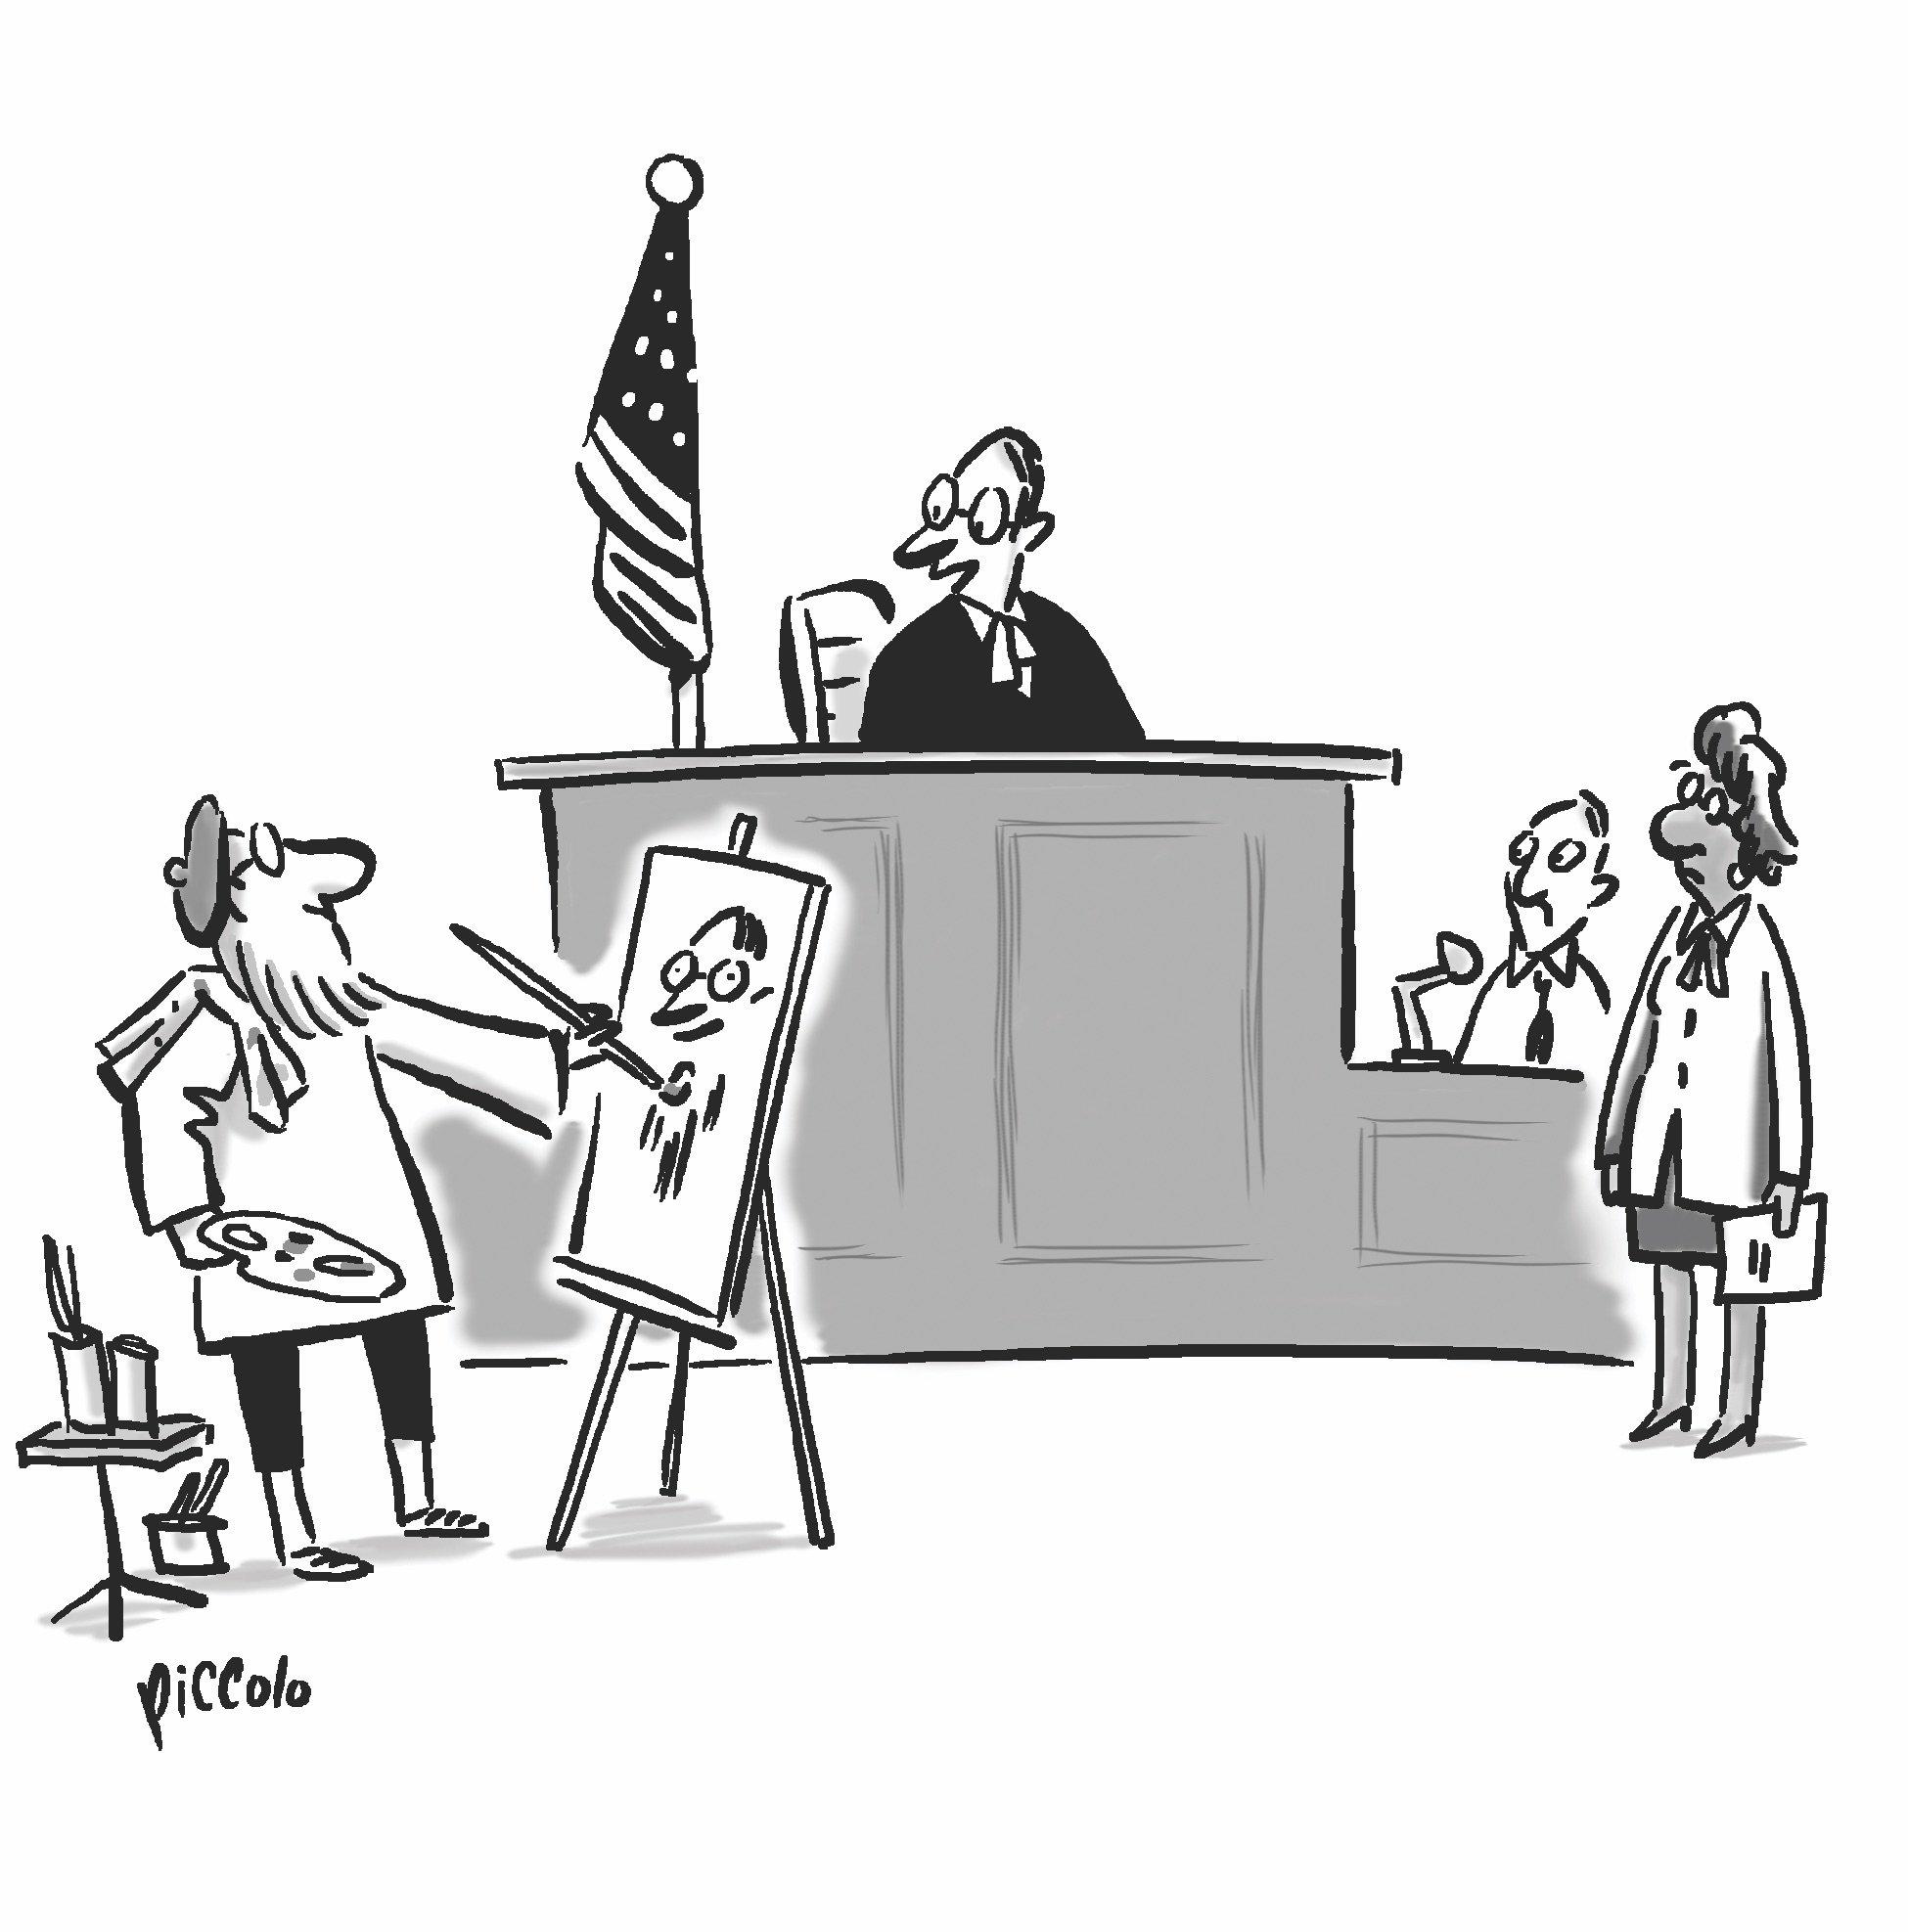 March 2019 cartoon